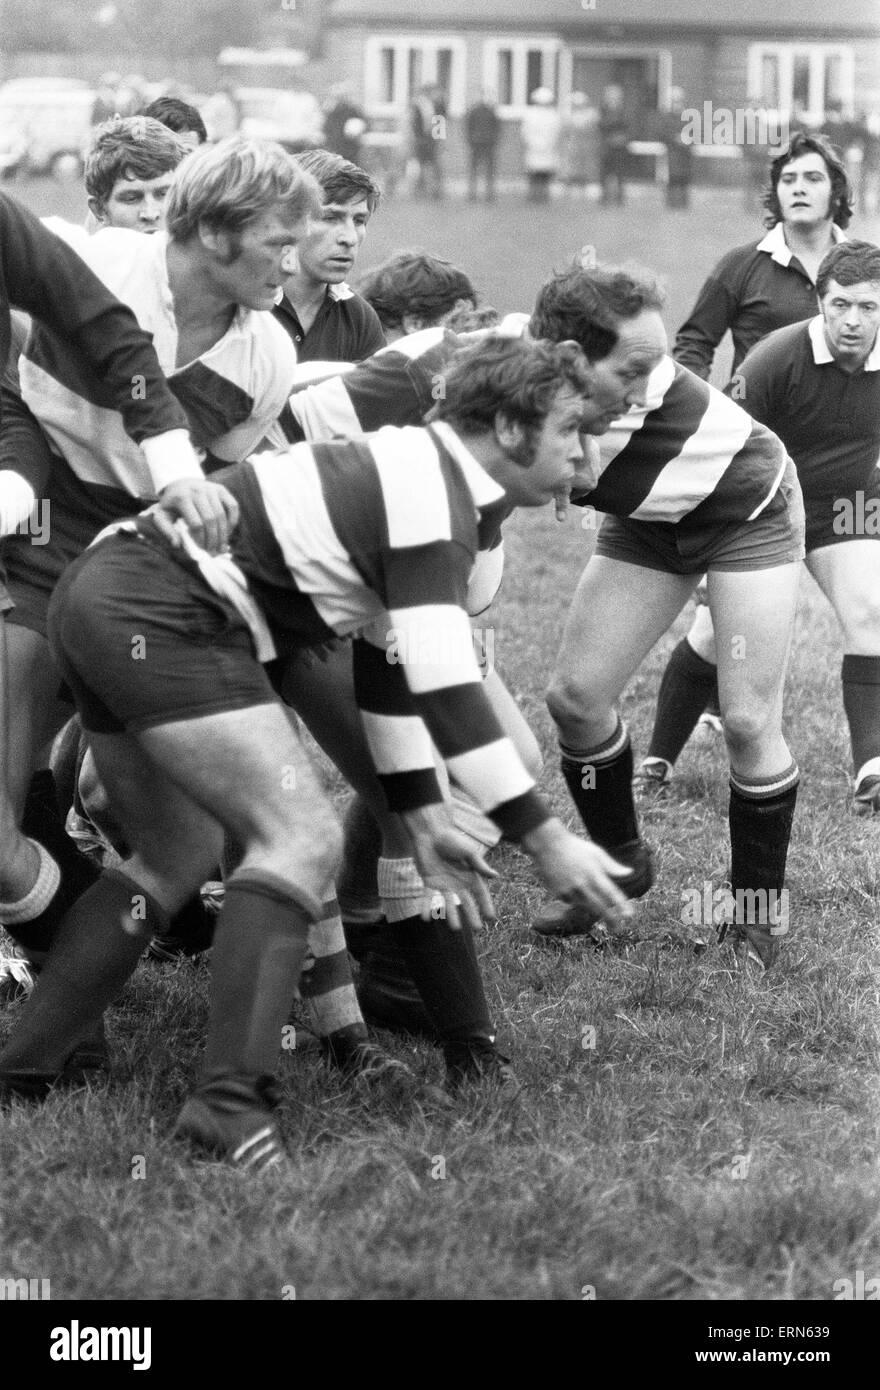 Stoke Old Boys v Phil Judd 15 Rugby Match, 28th September 1971 - Stock Image